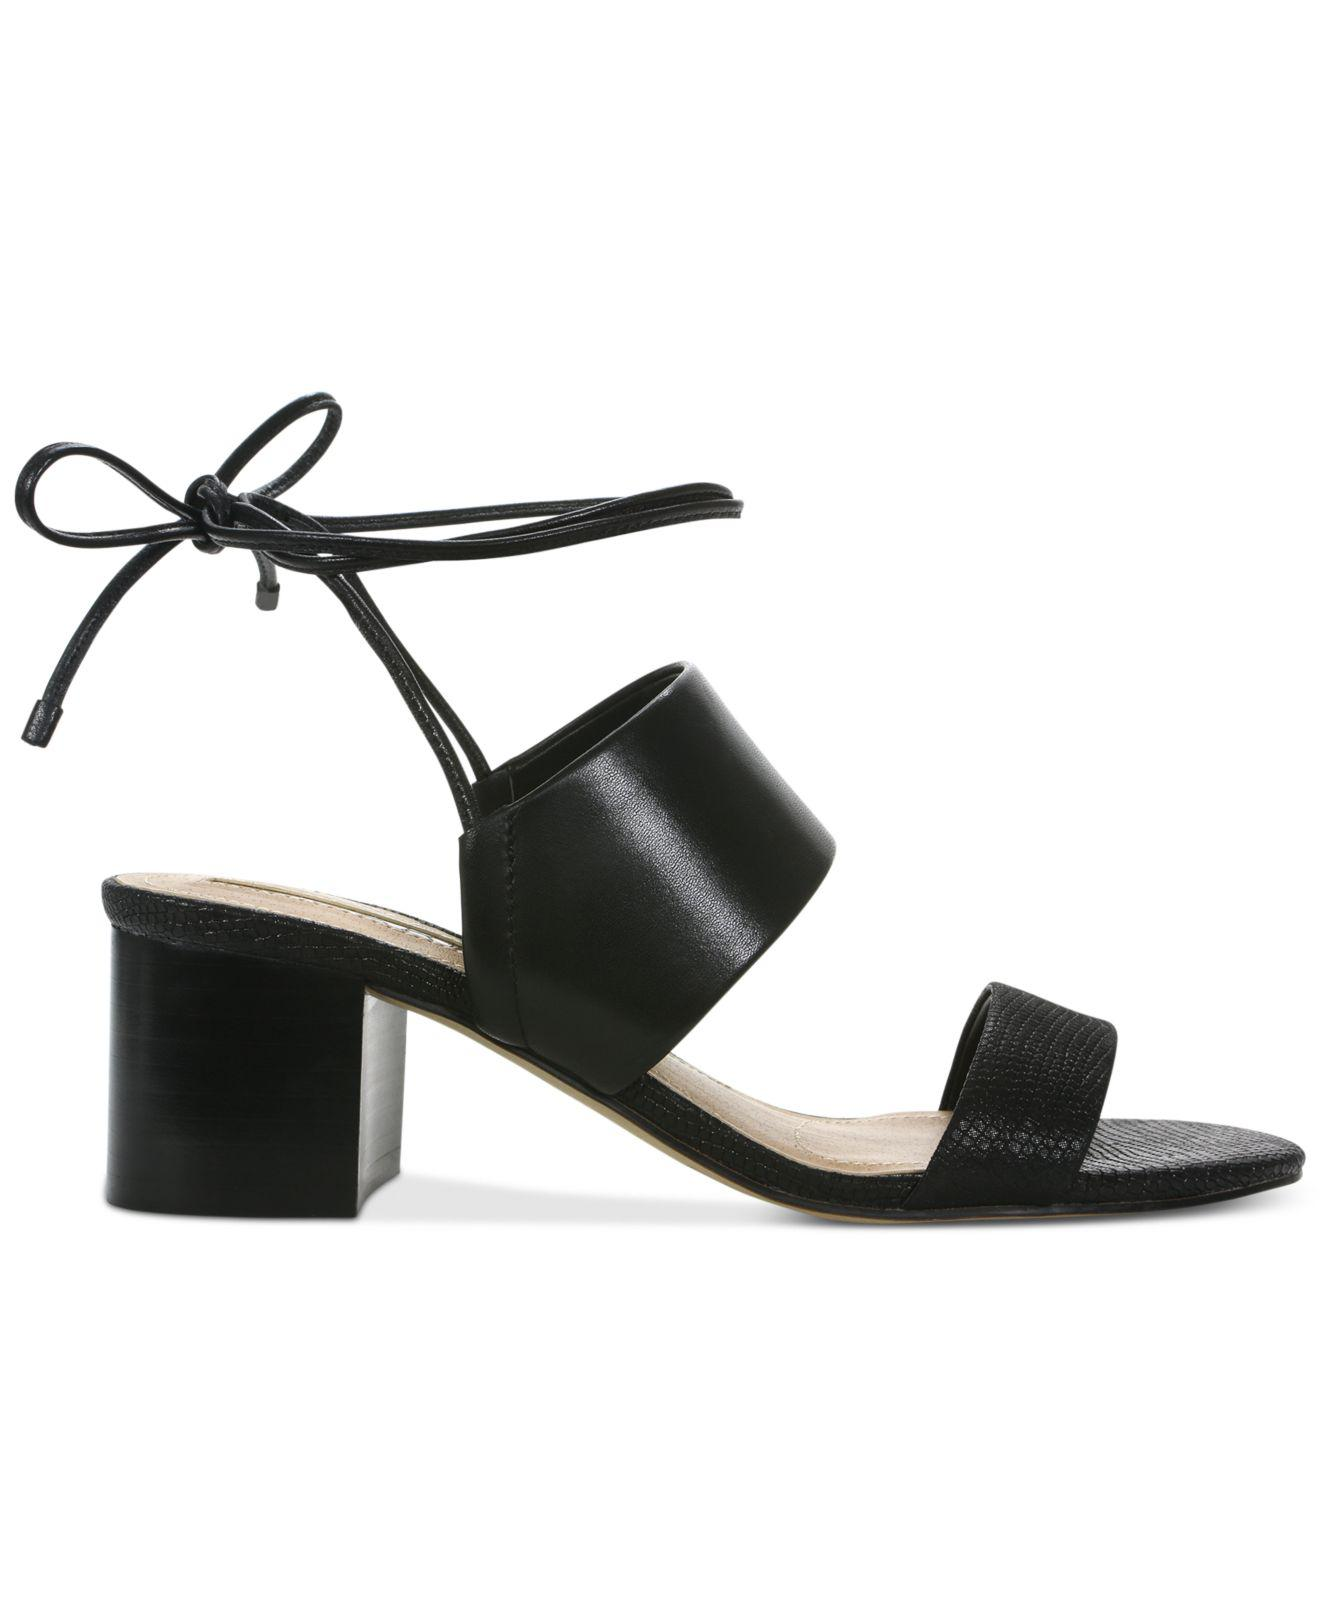 ede6b317bb60 Lyst - Tahari Doe Lace-up Sandals in Black